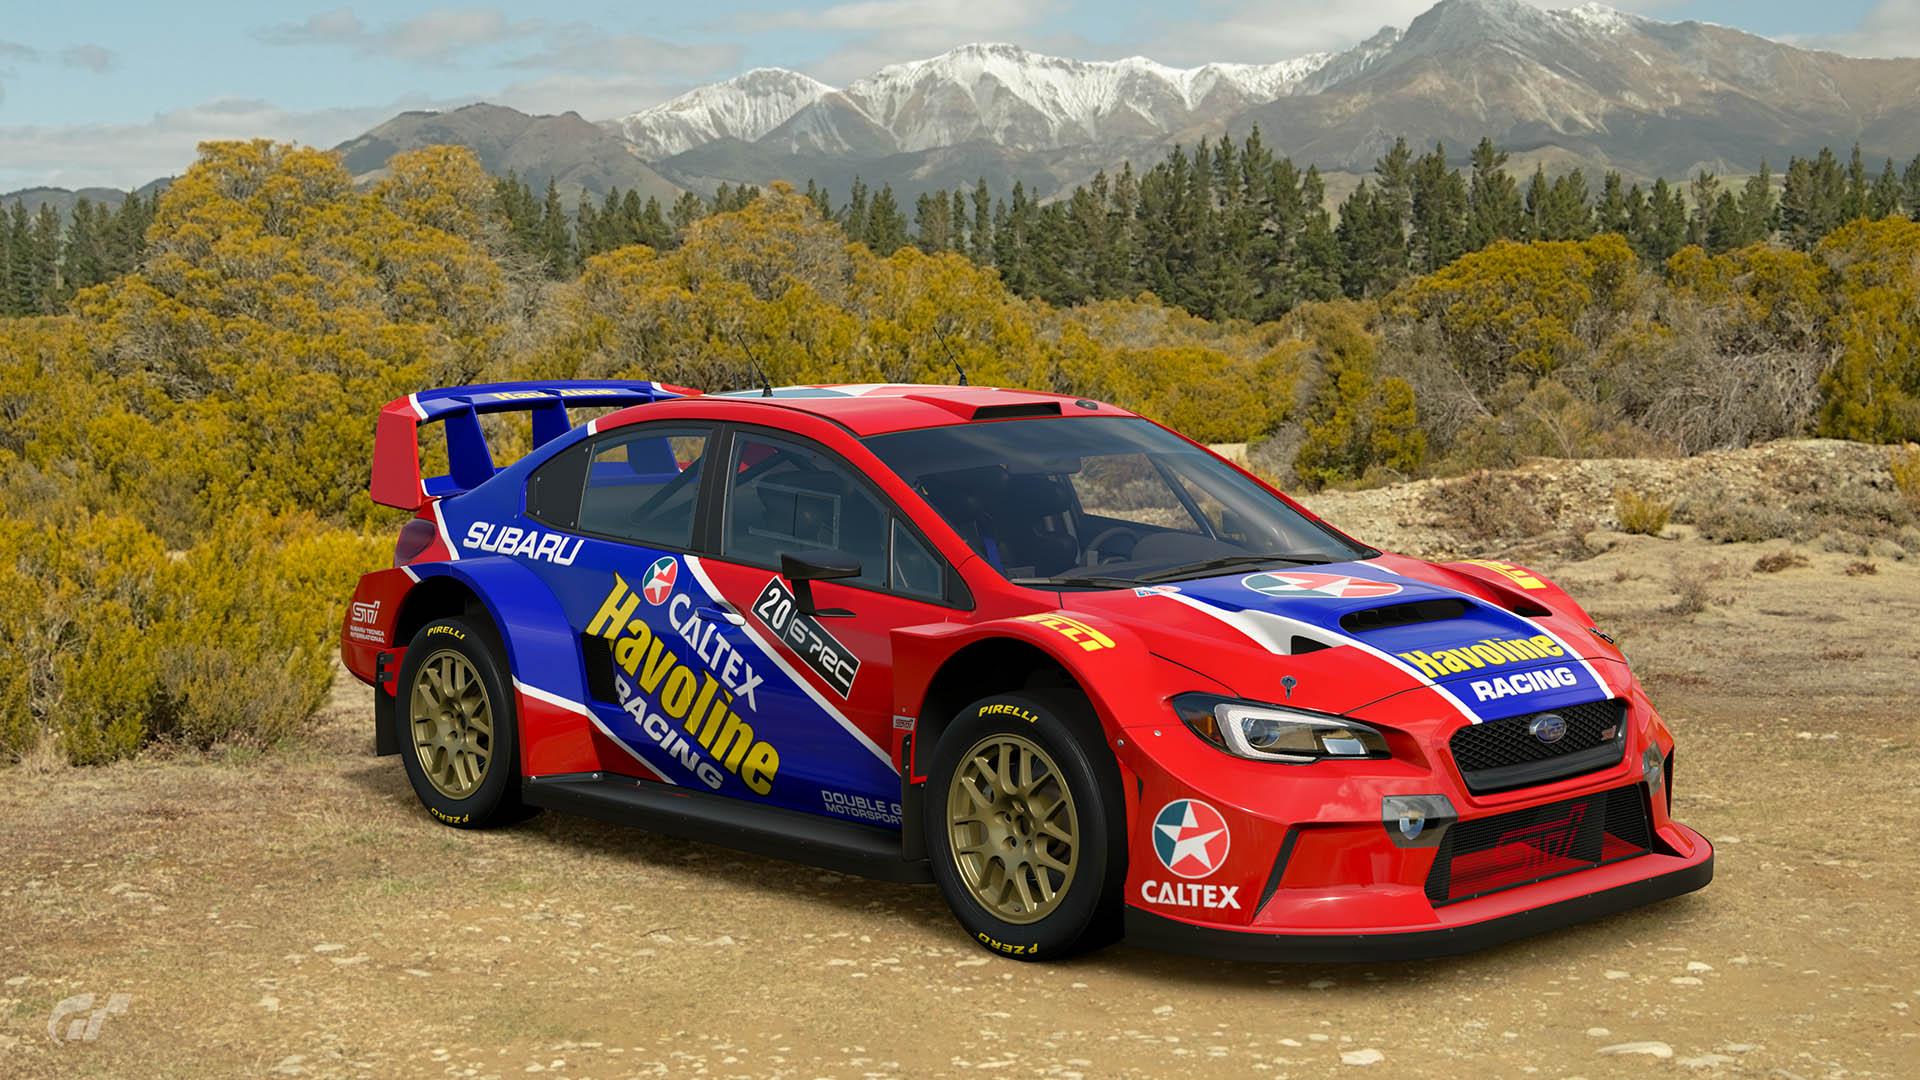 Possum Bourne Havoline Subaru WRX Tribute Livery – GT Sport